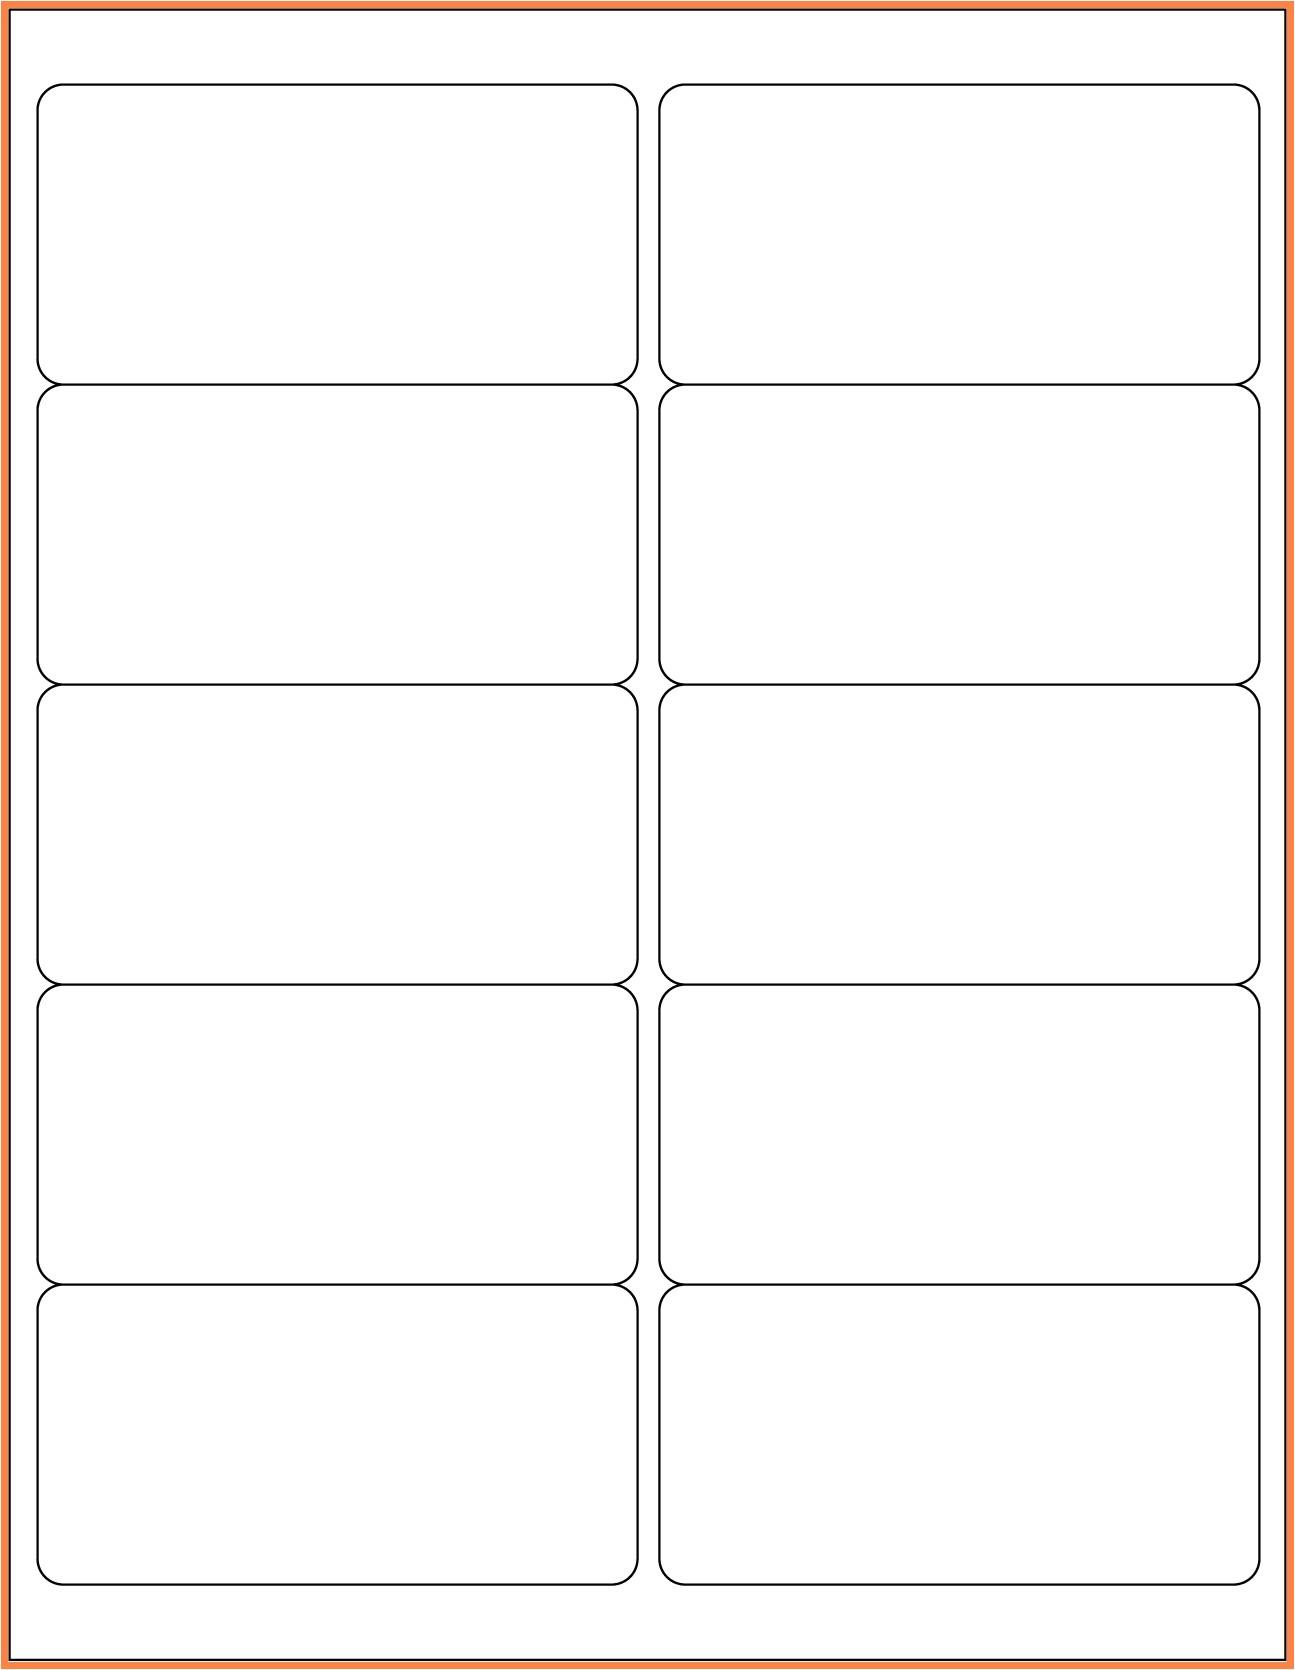 2x4 label template pdf